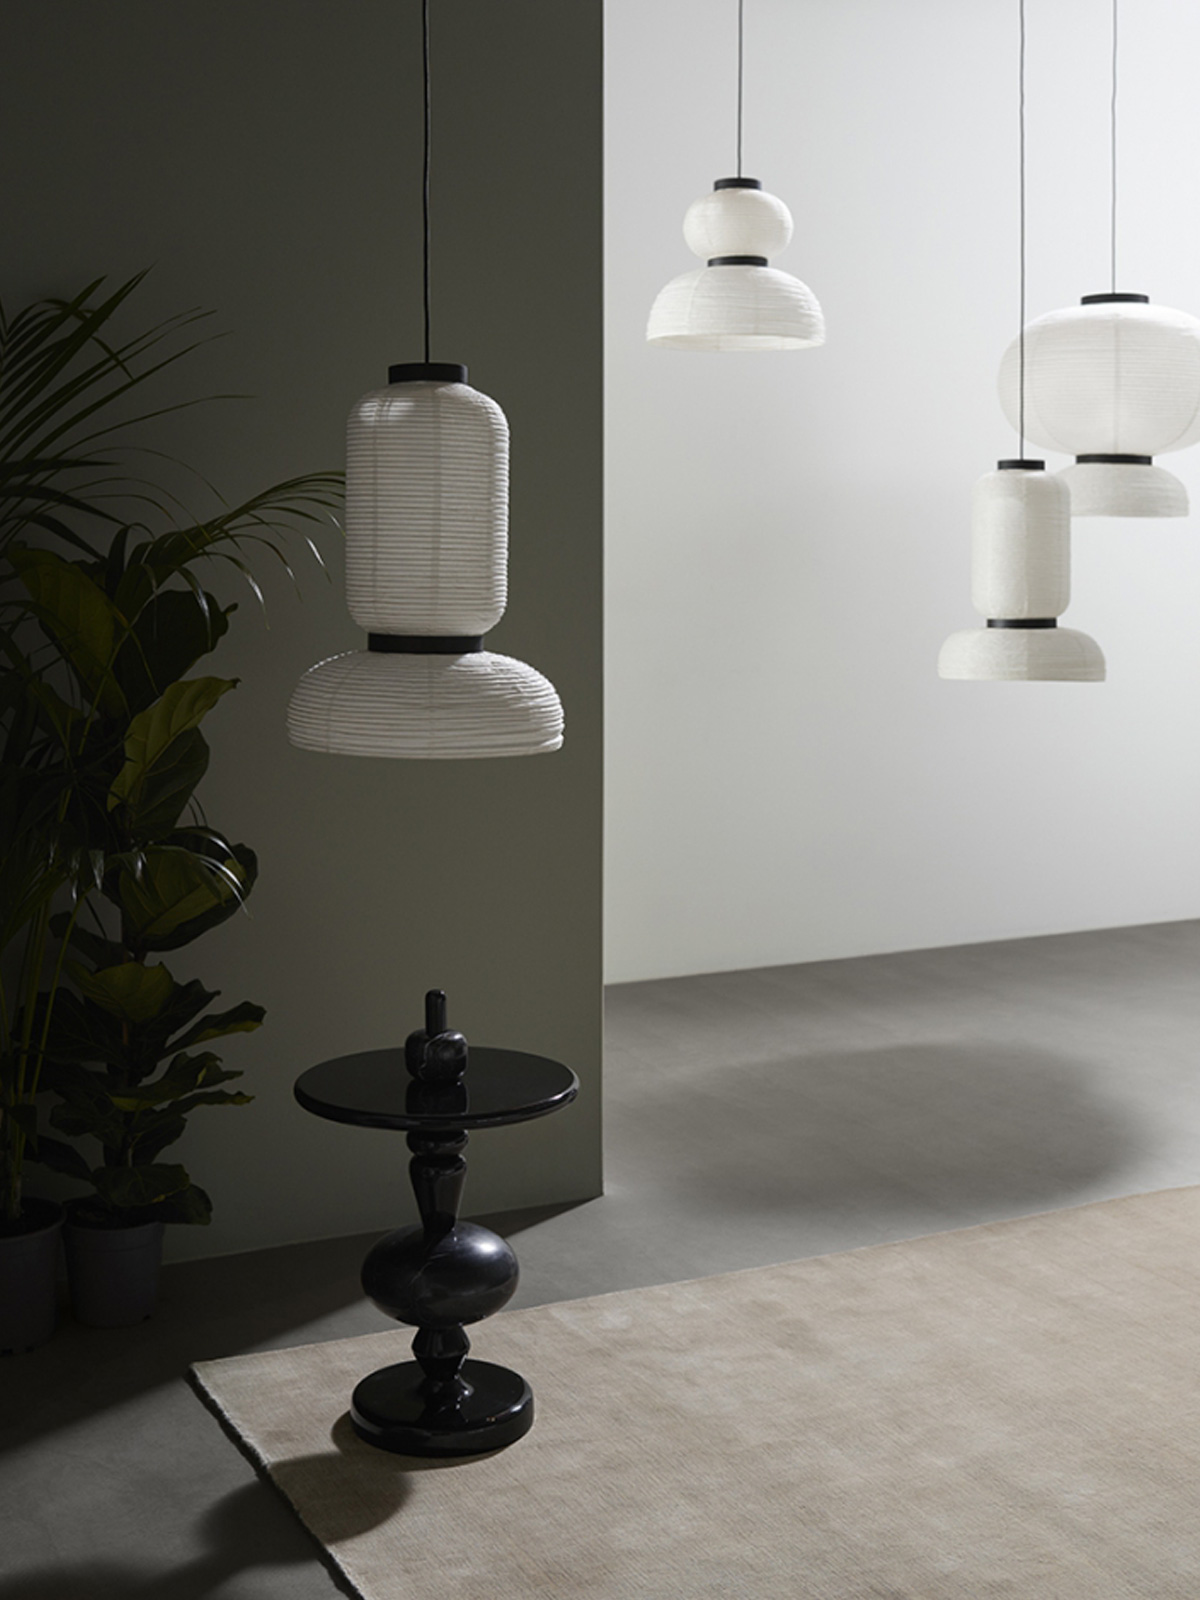 Cool-Wall-Lamp-Frandsen-DesignOrt